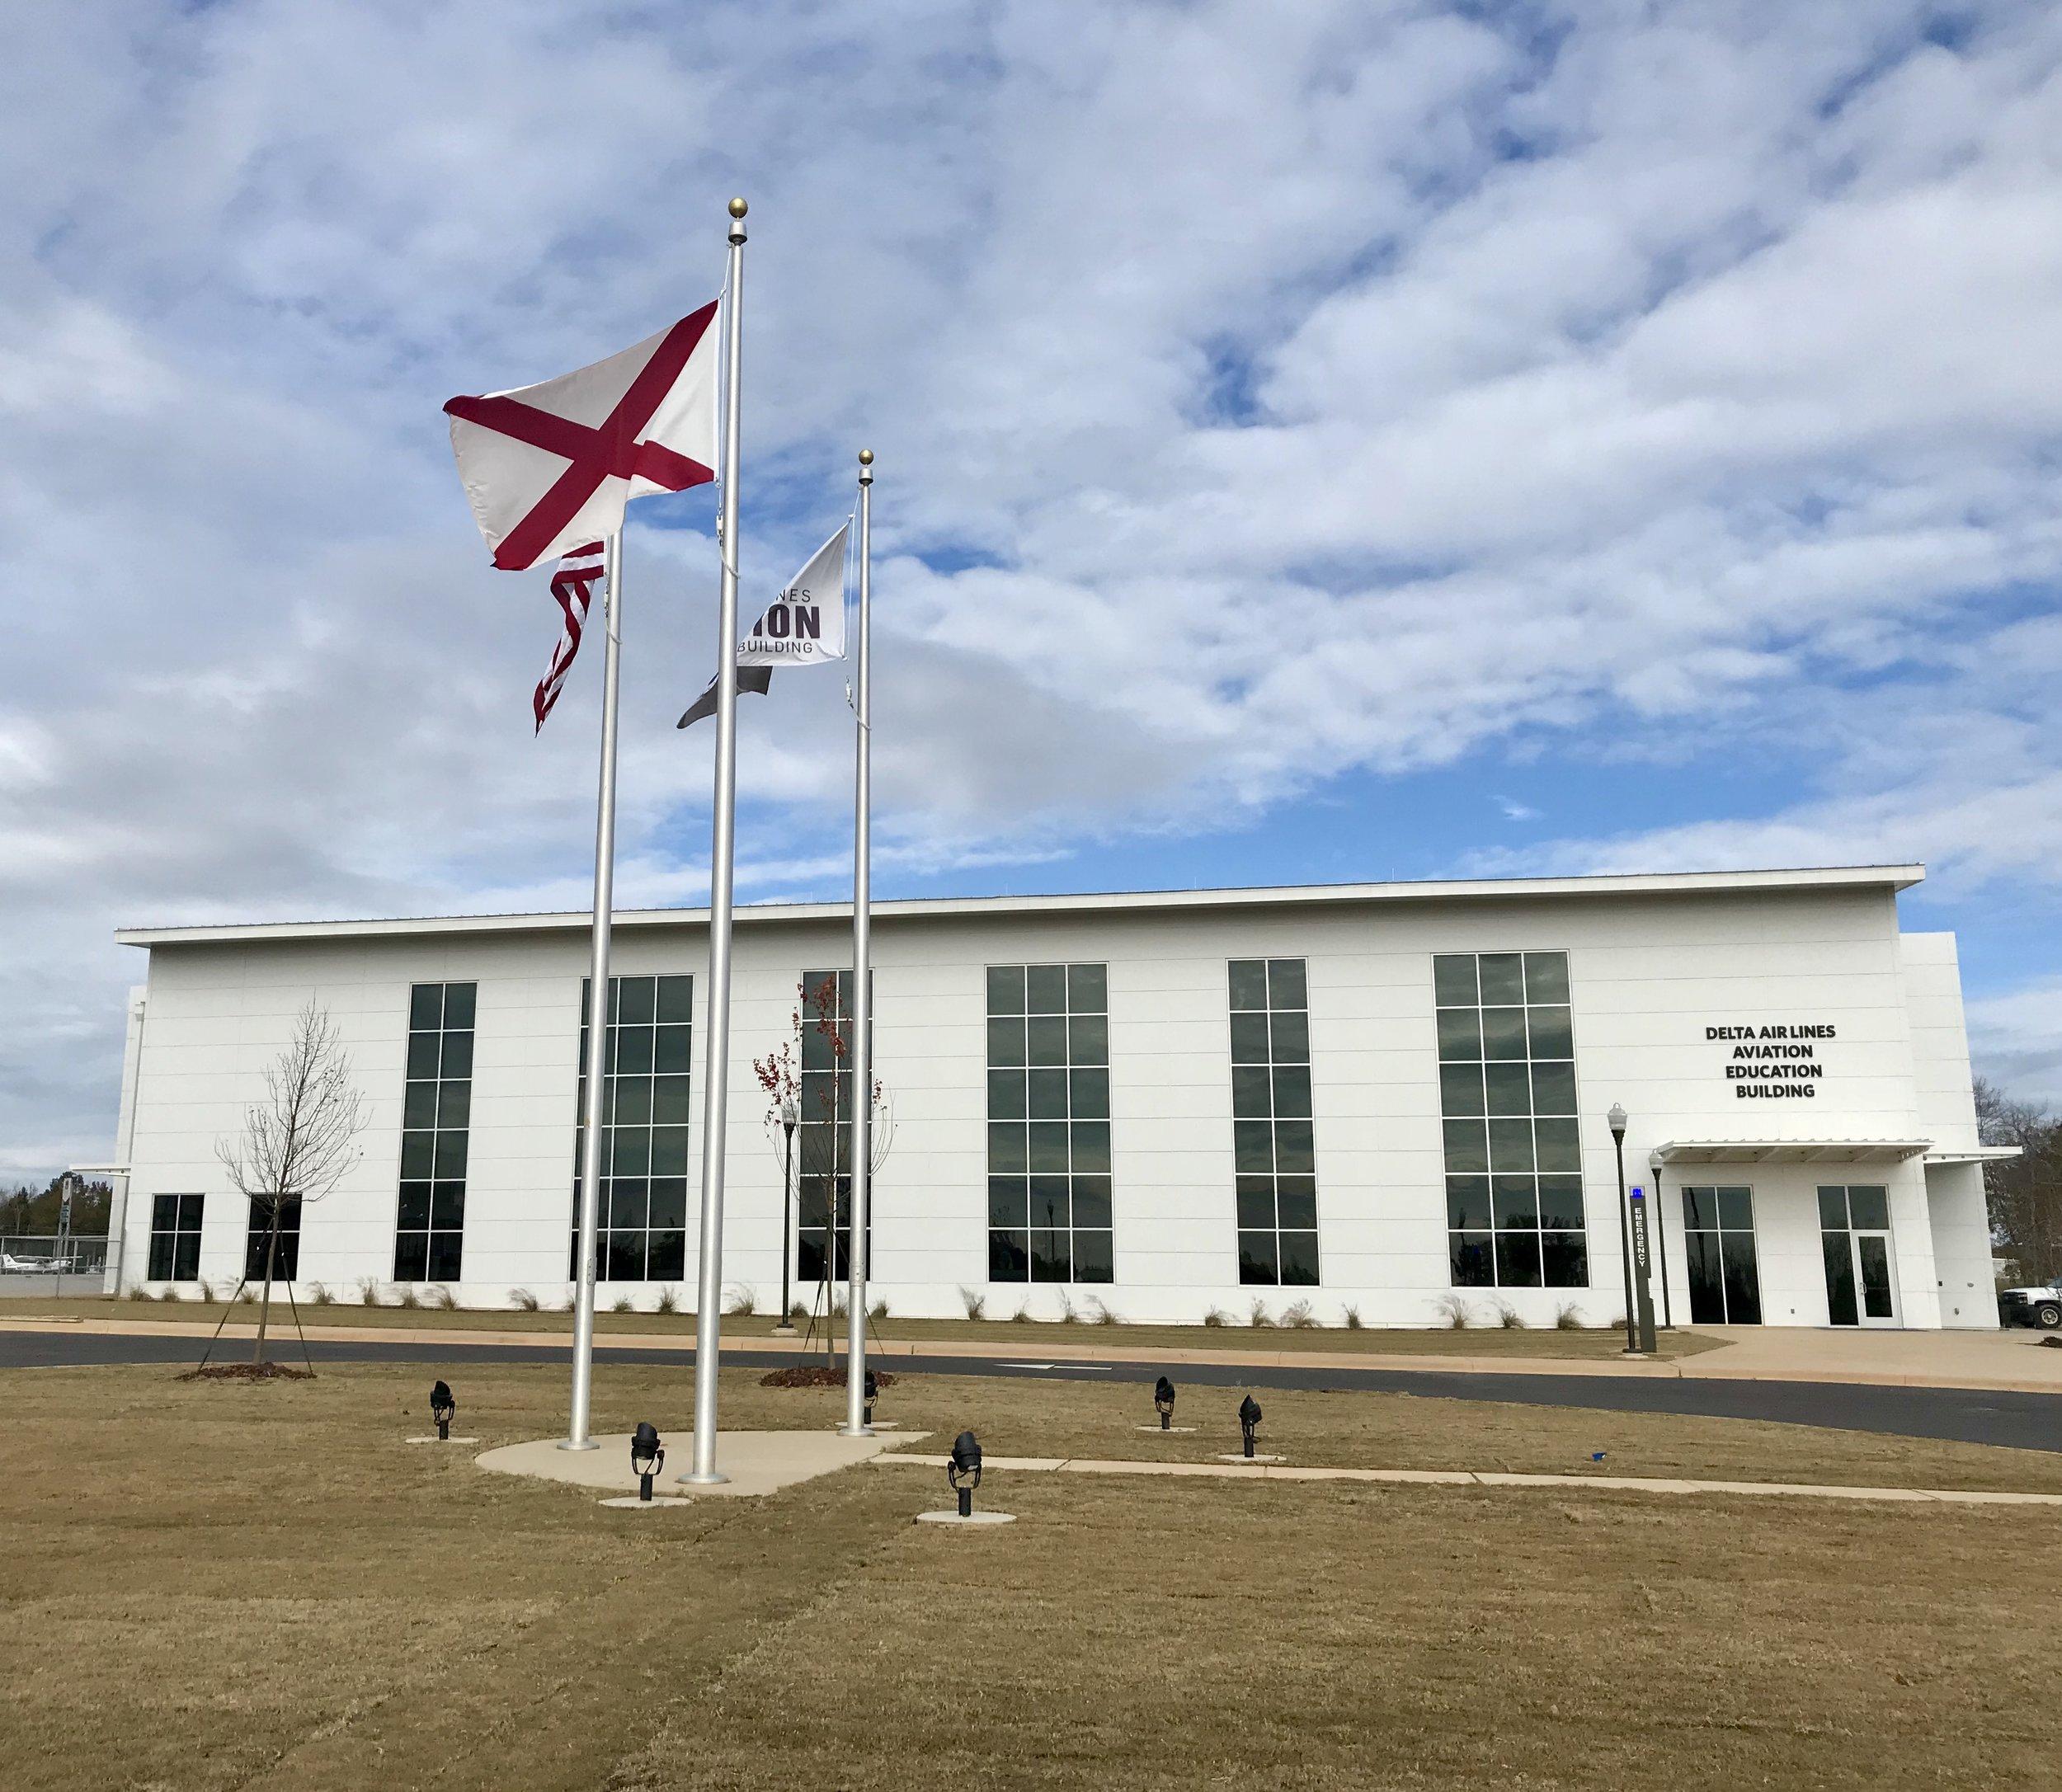 Delta Aviation Education Building, Auburn University